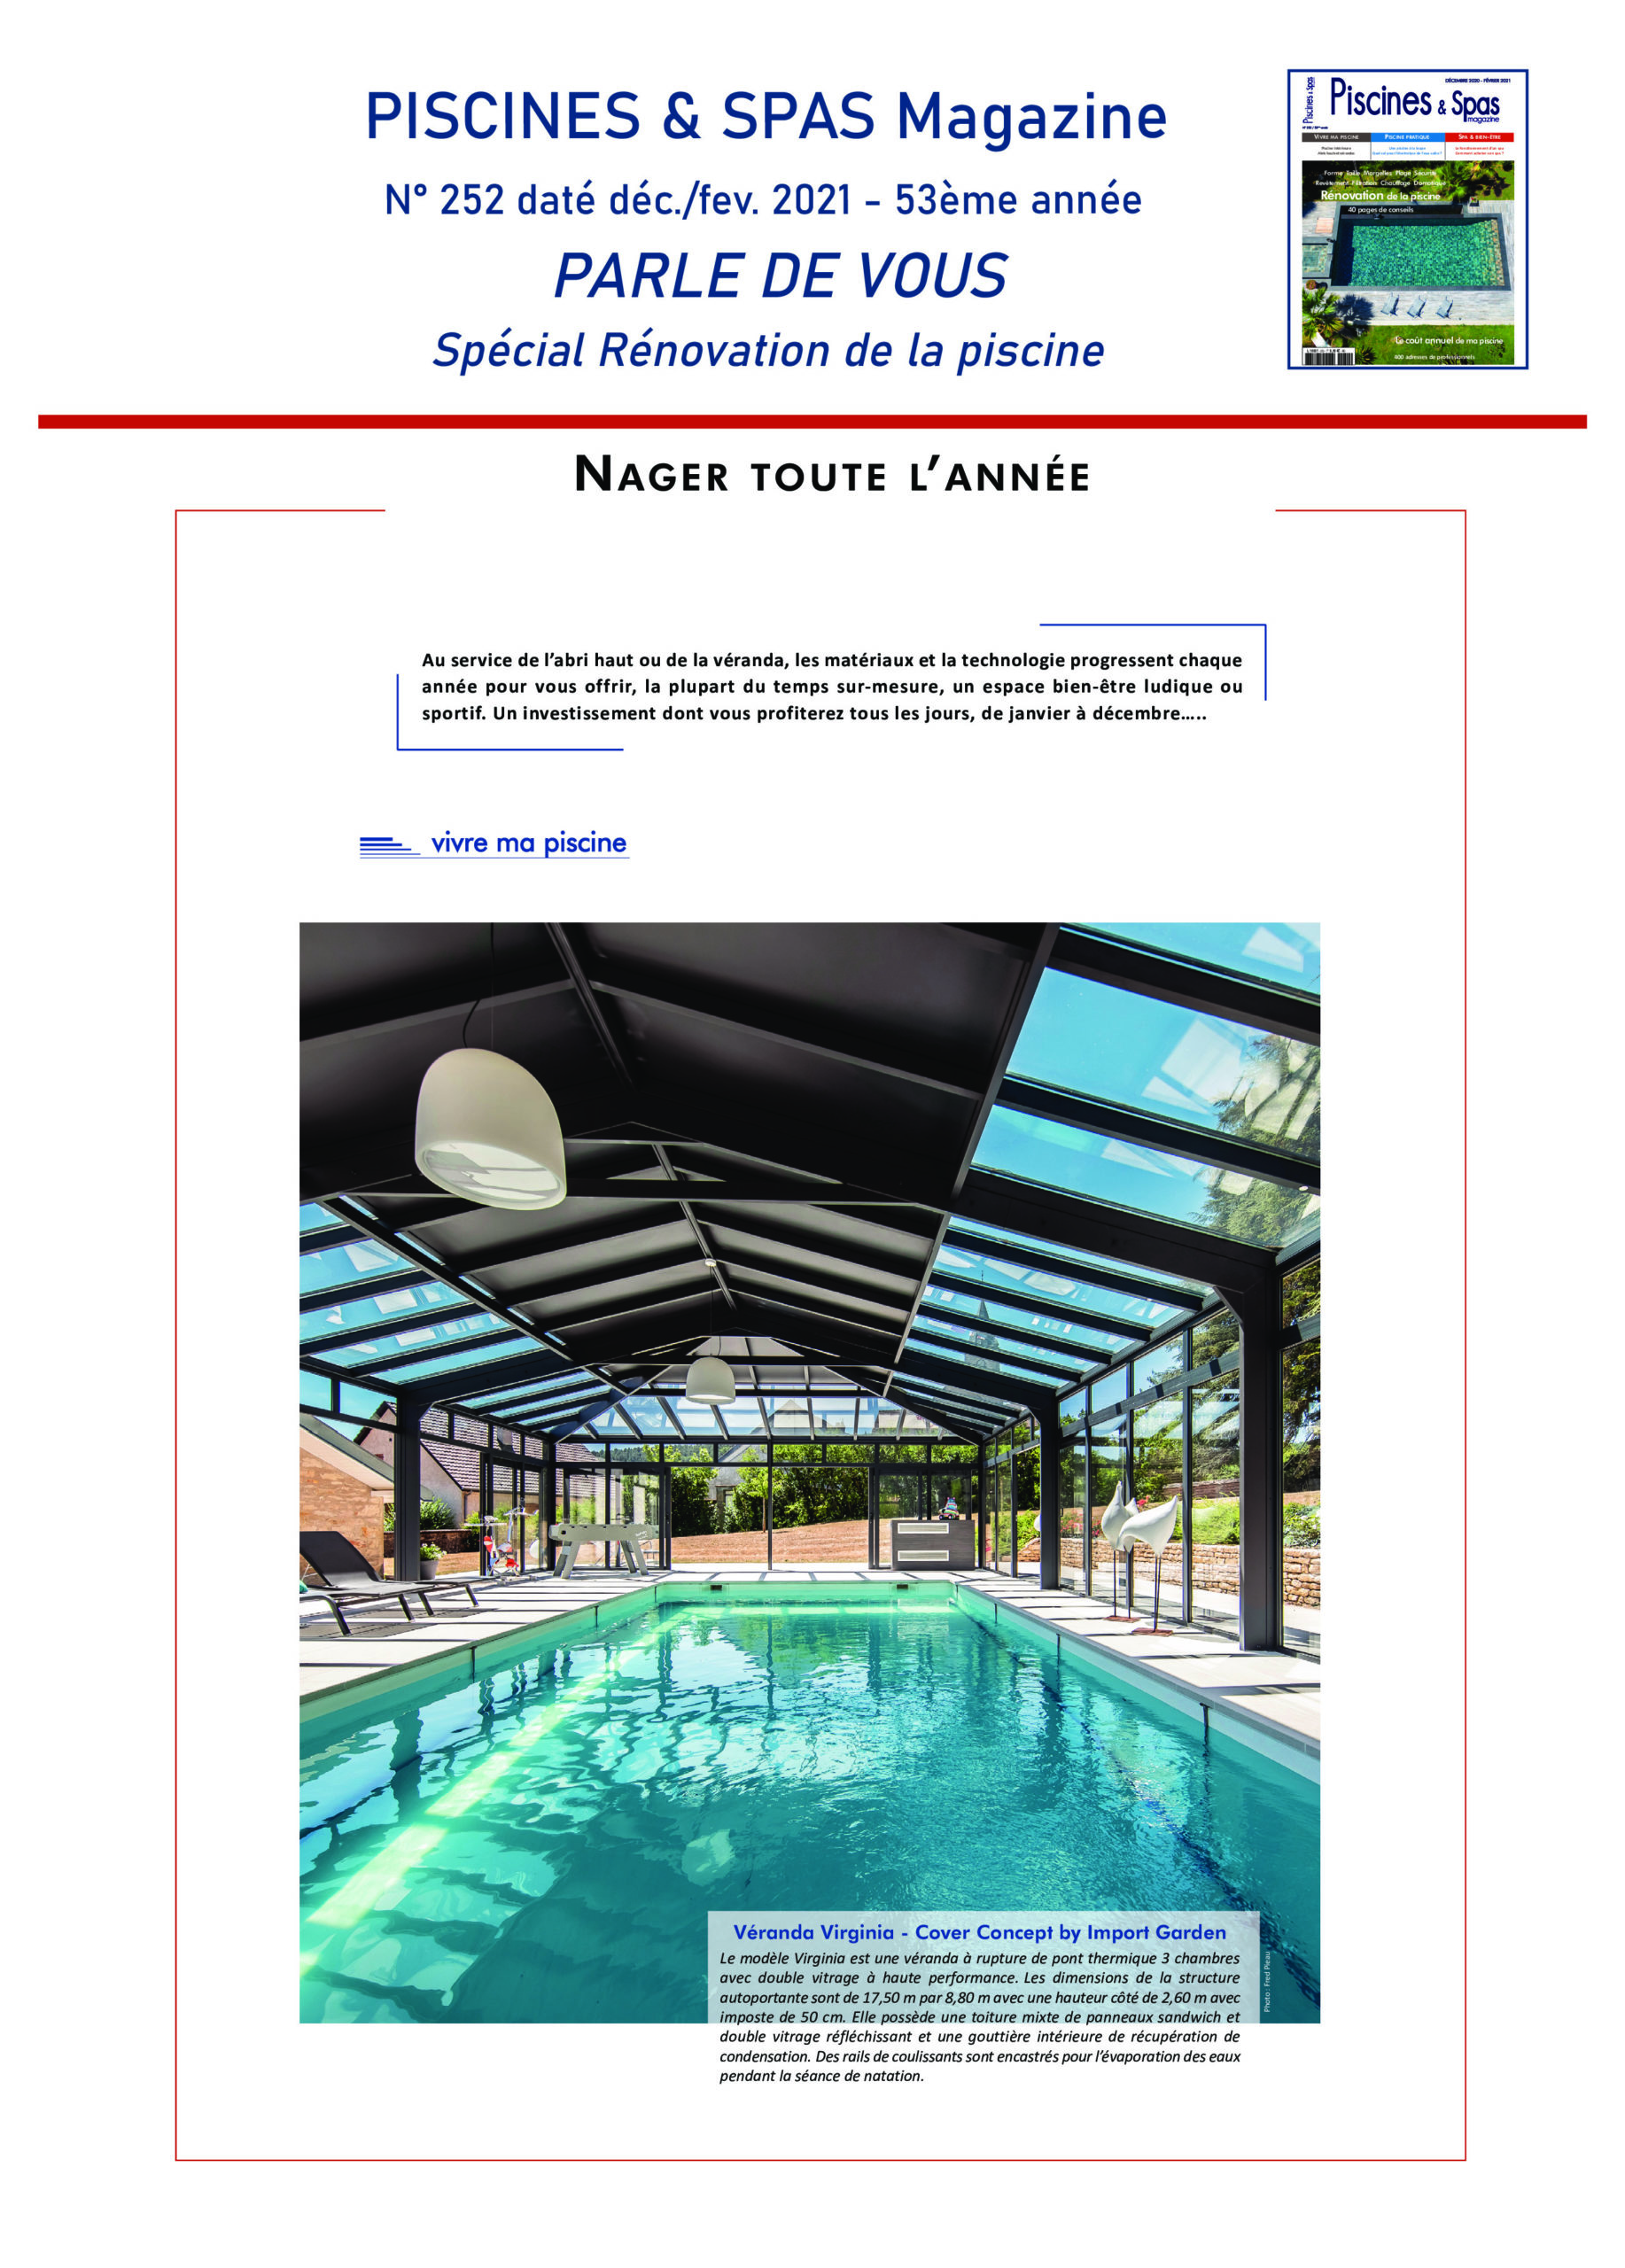 Cover Concept by Import Garden dans Piscines et Spas magazine n°252